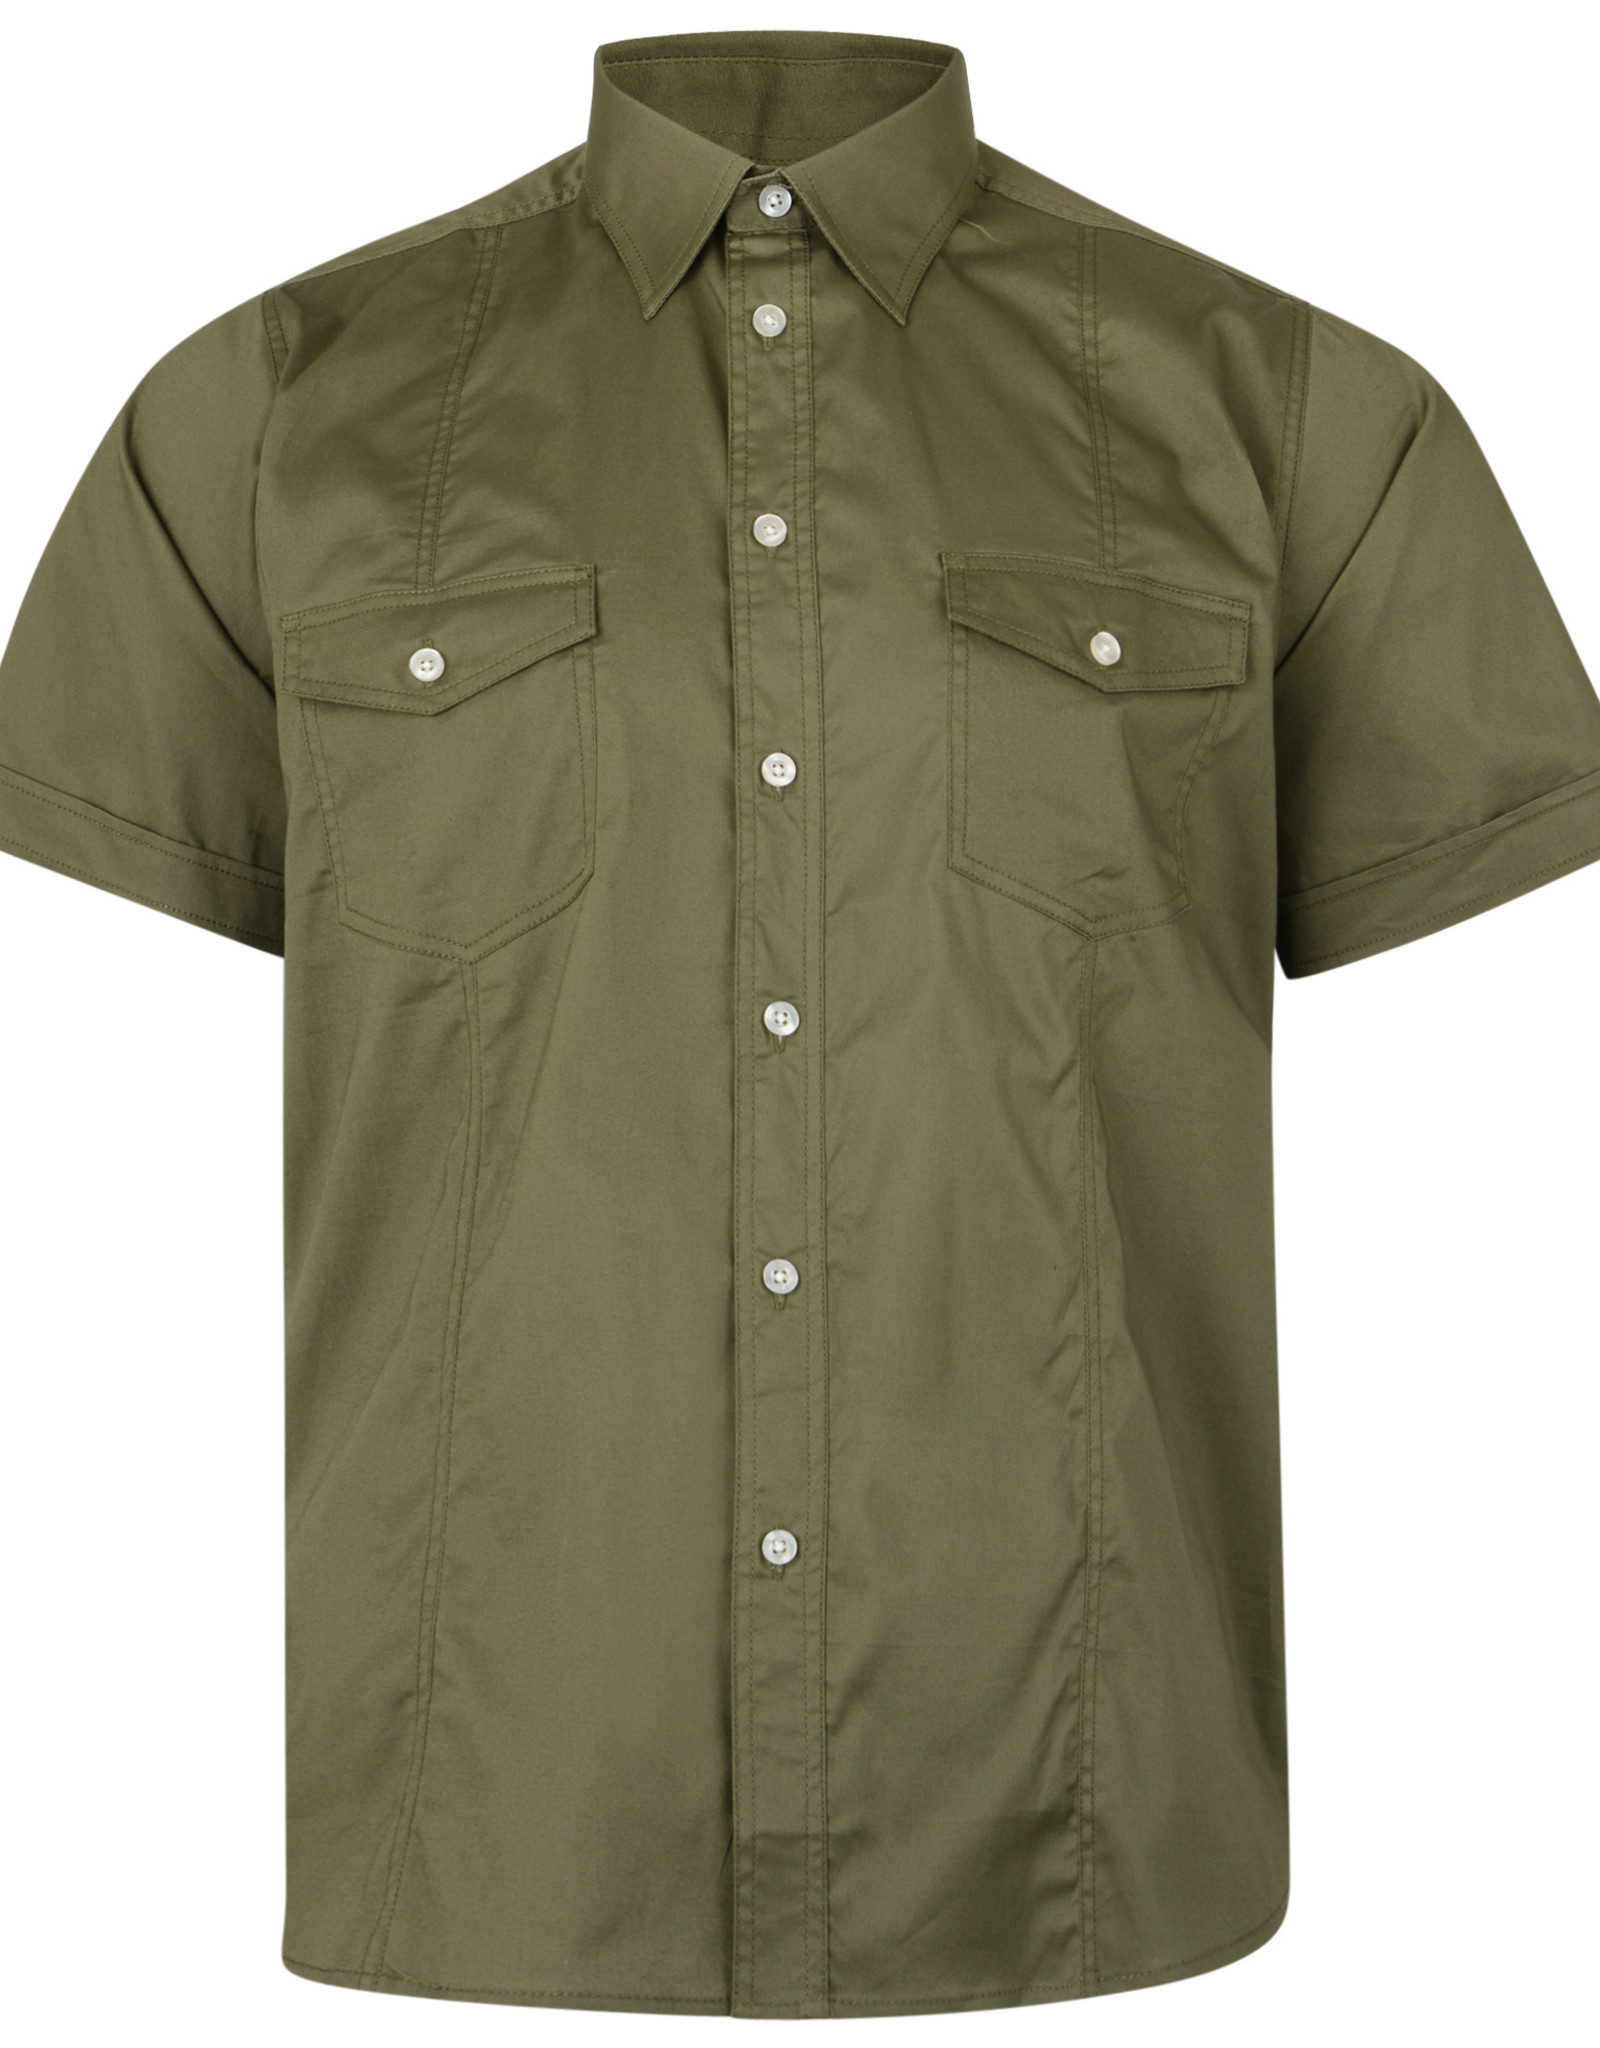 Kam Jeans OVERHEMD retro stretch - khaki groen